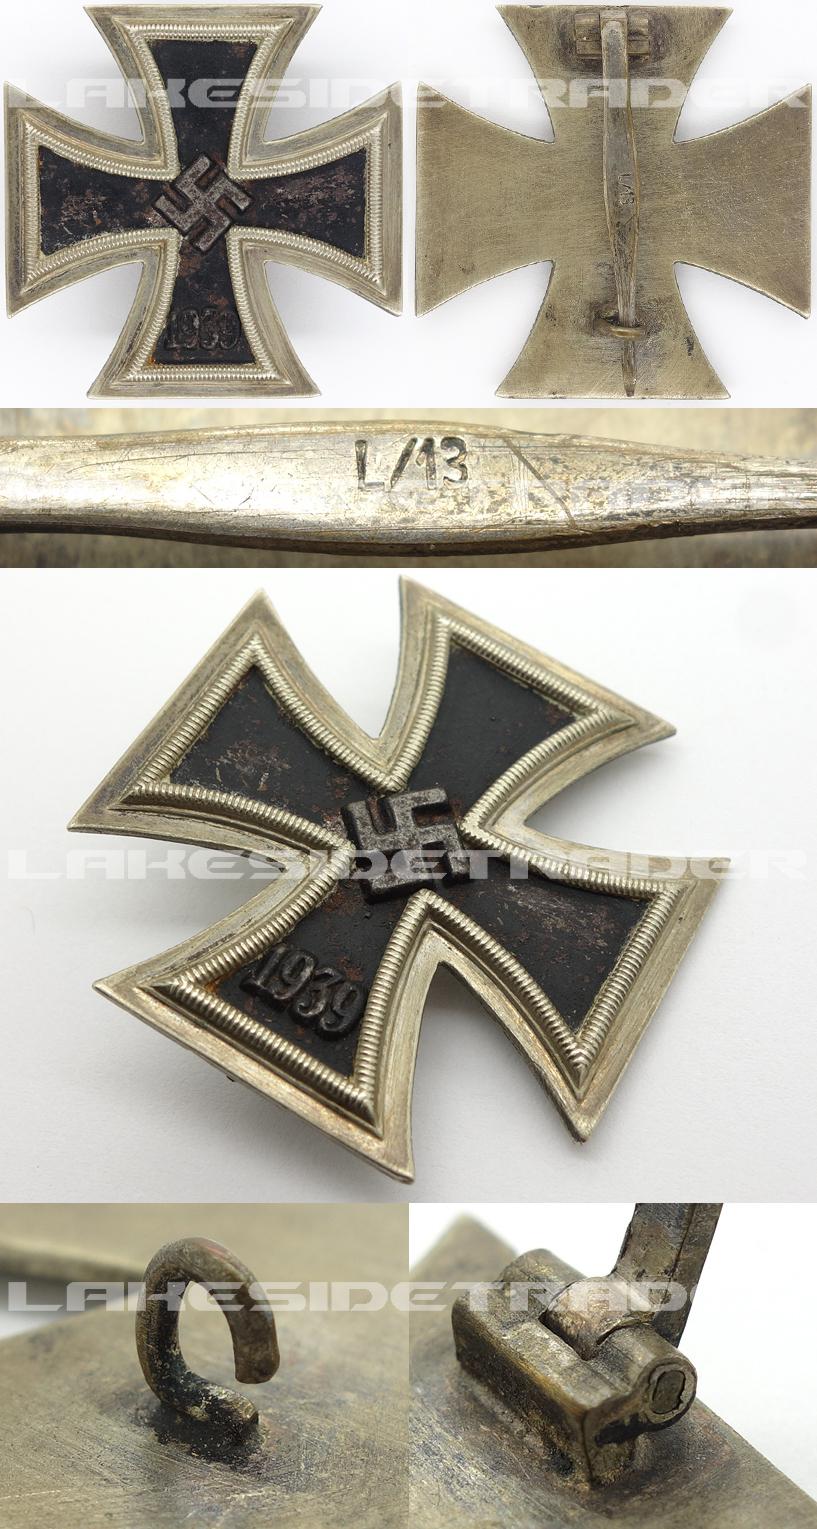 1st Class Iron Cross by L/13